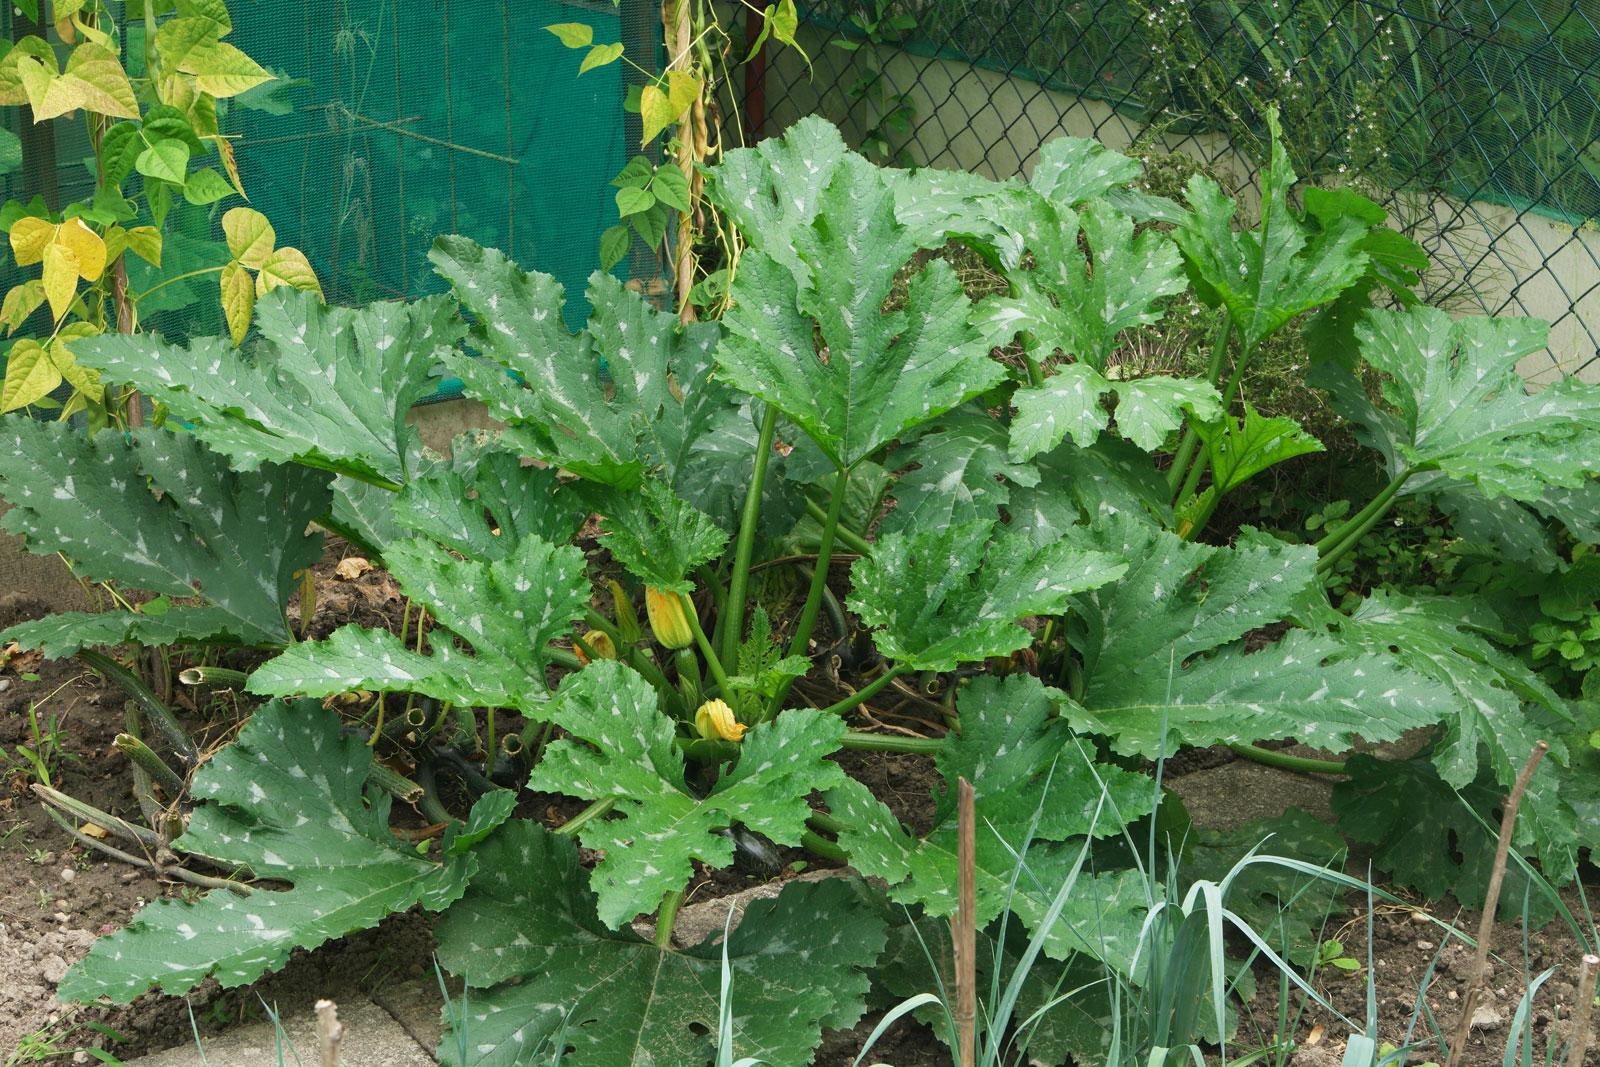 Cucurbita pepo ssp. pepo